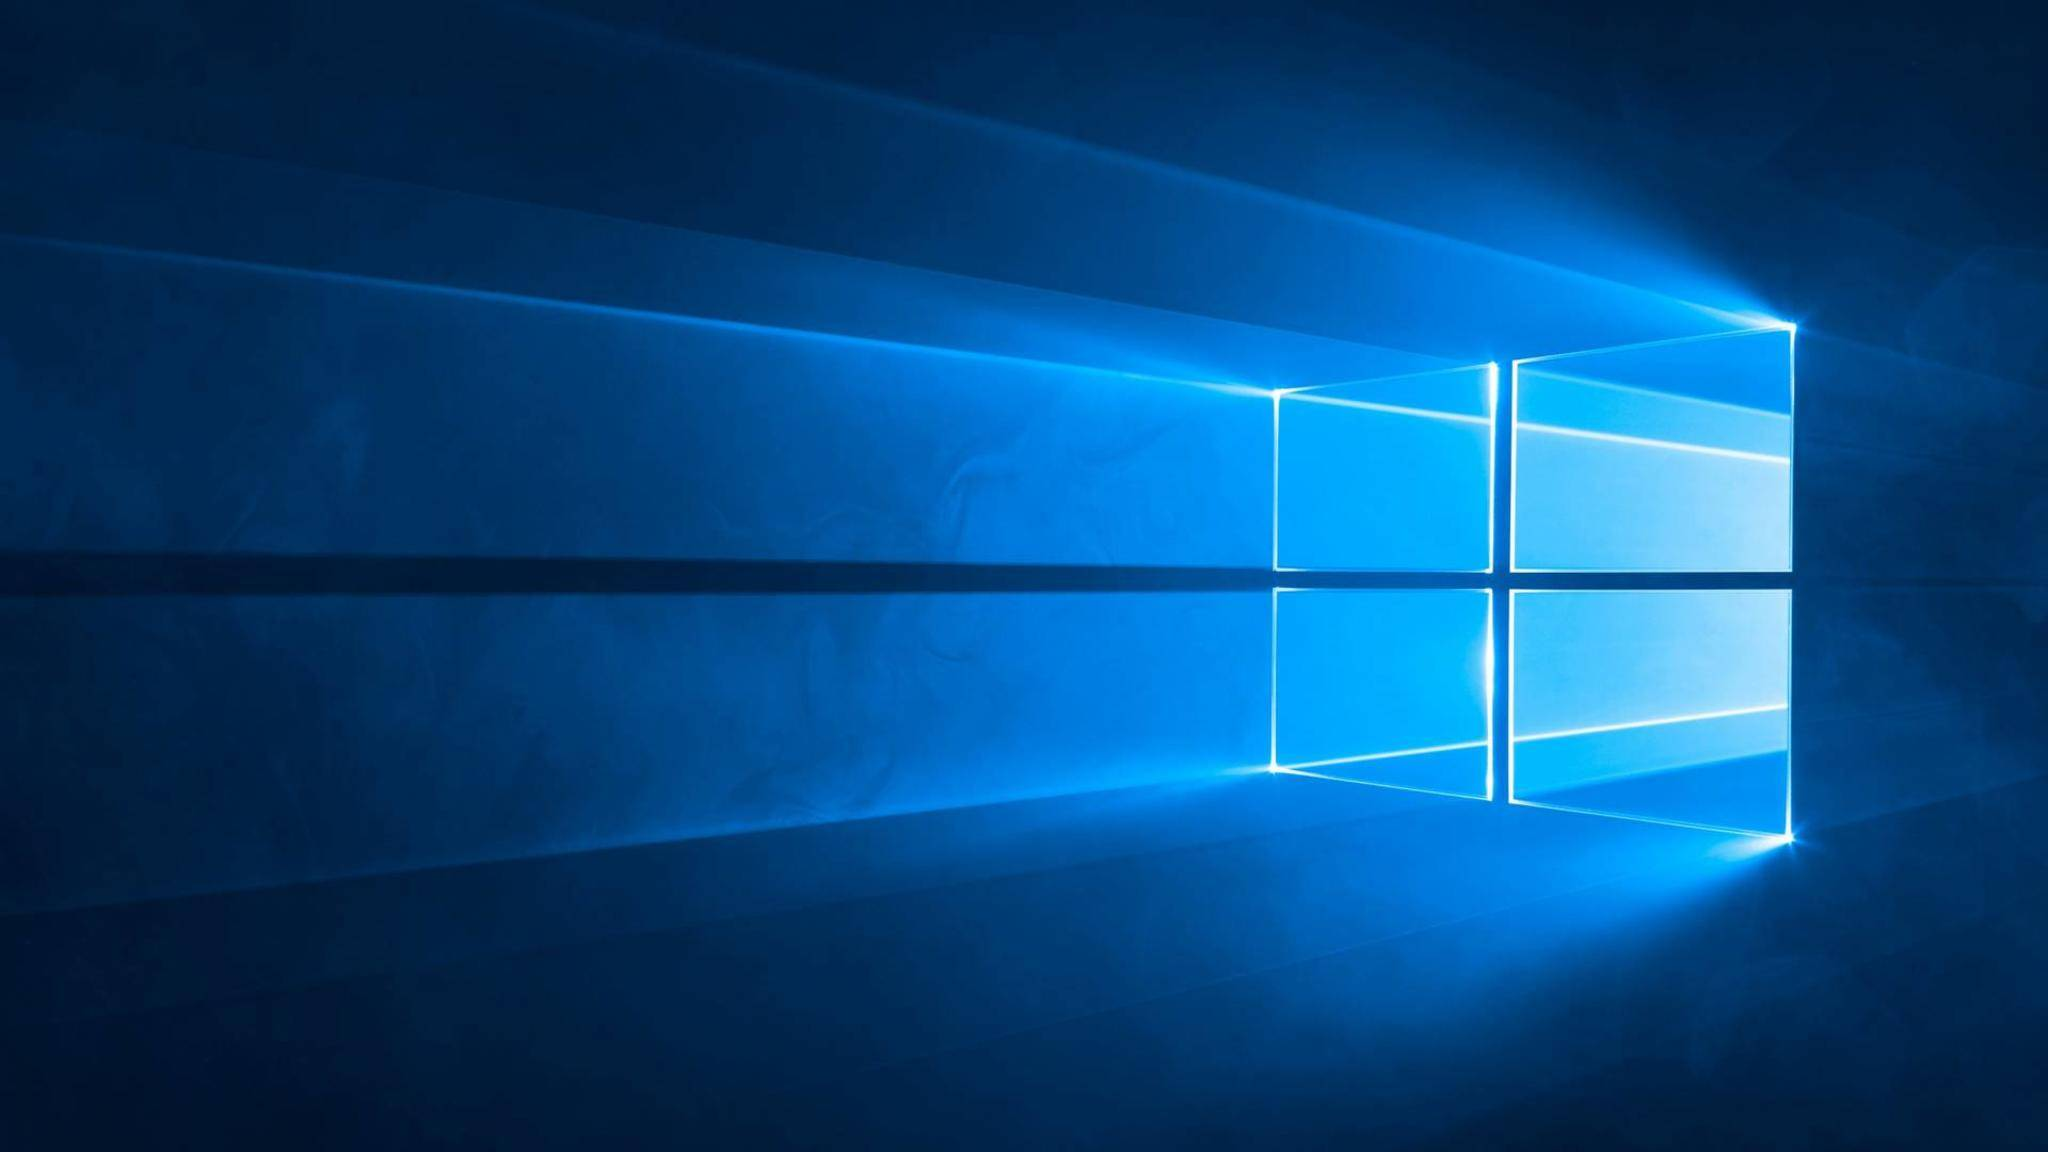 Windows-10-Updates sollen in Zukunft weniger nerven.